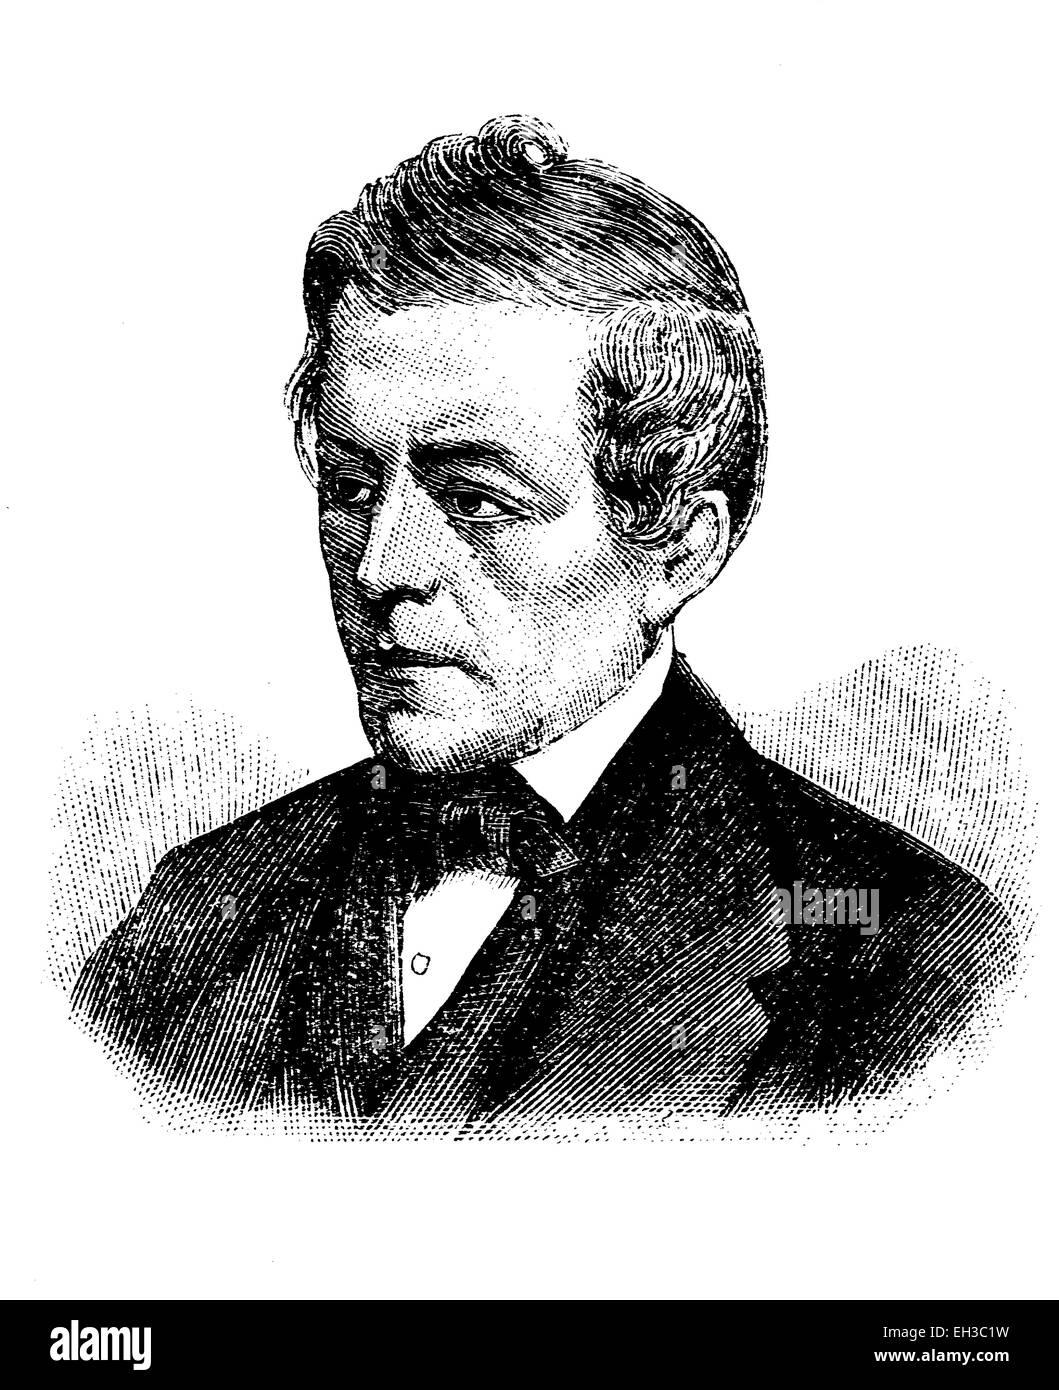 David Friedrich Strauss, 1808-1874, German writer, philosopher and theologian, historic woodcut, c. 1880 - Stock Image